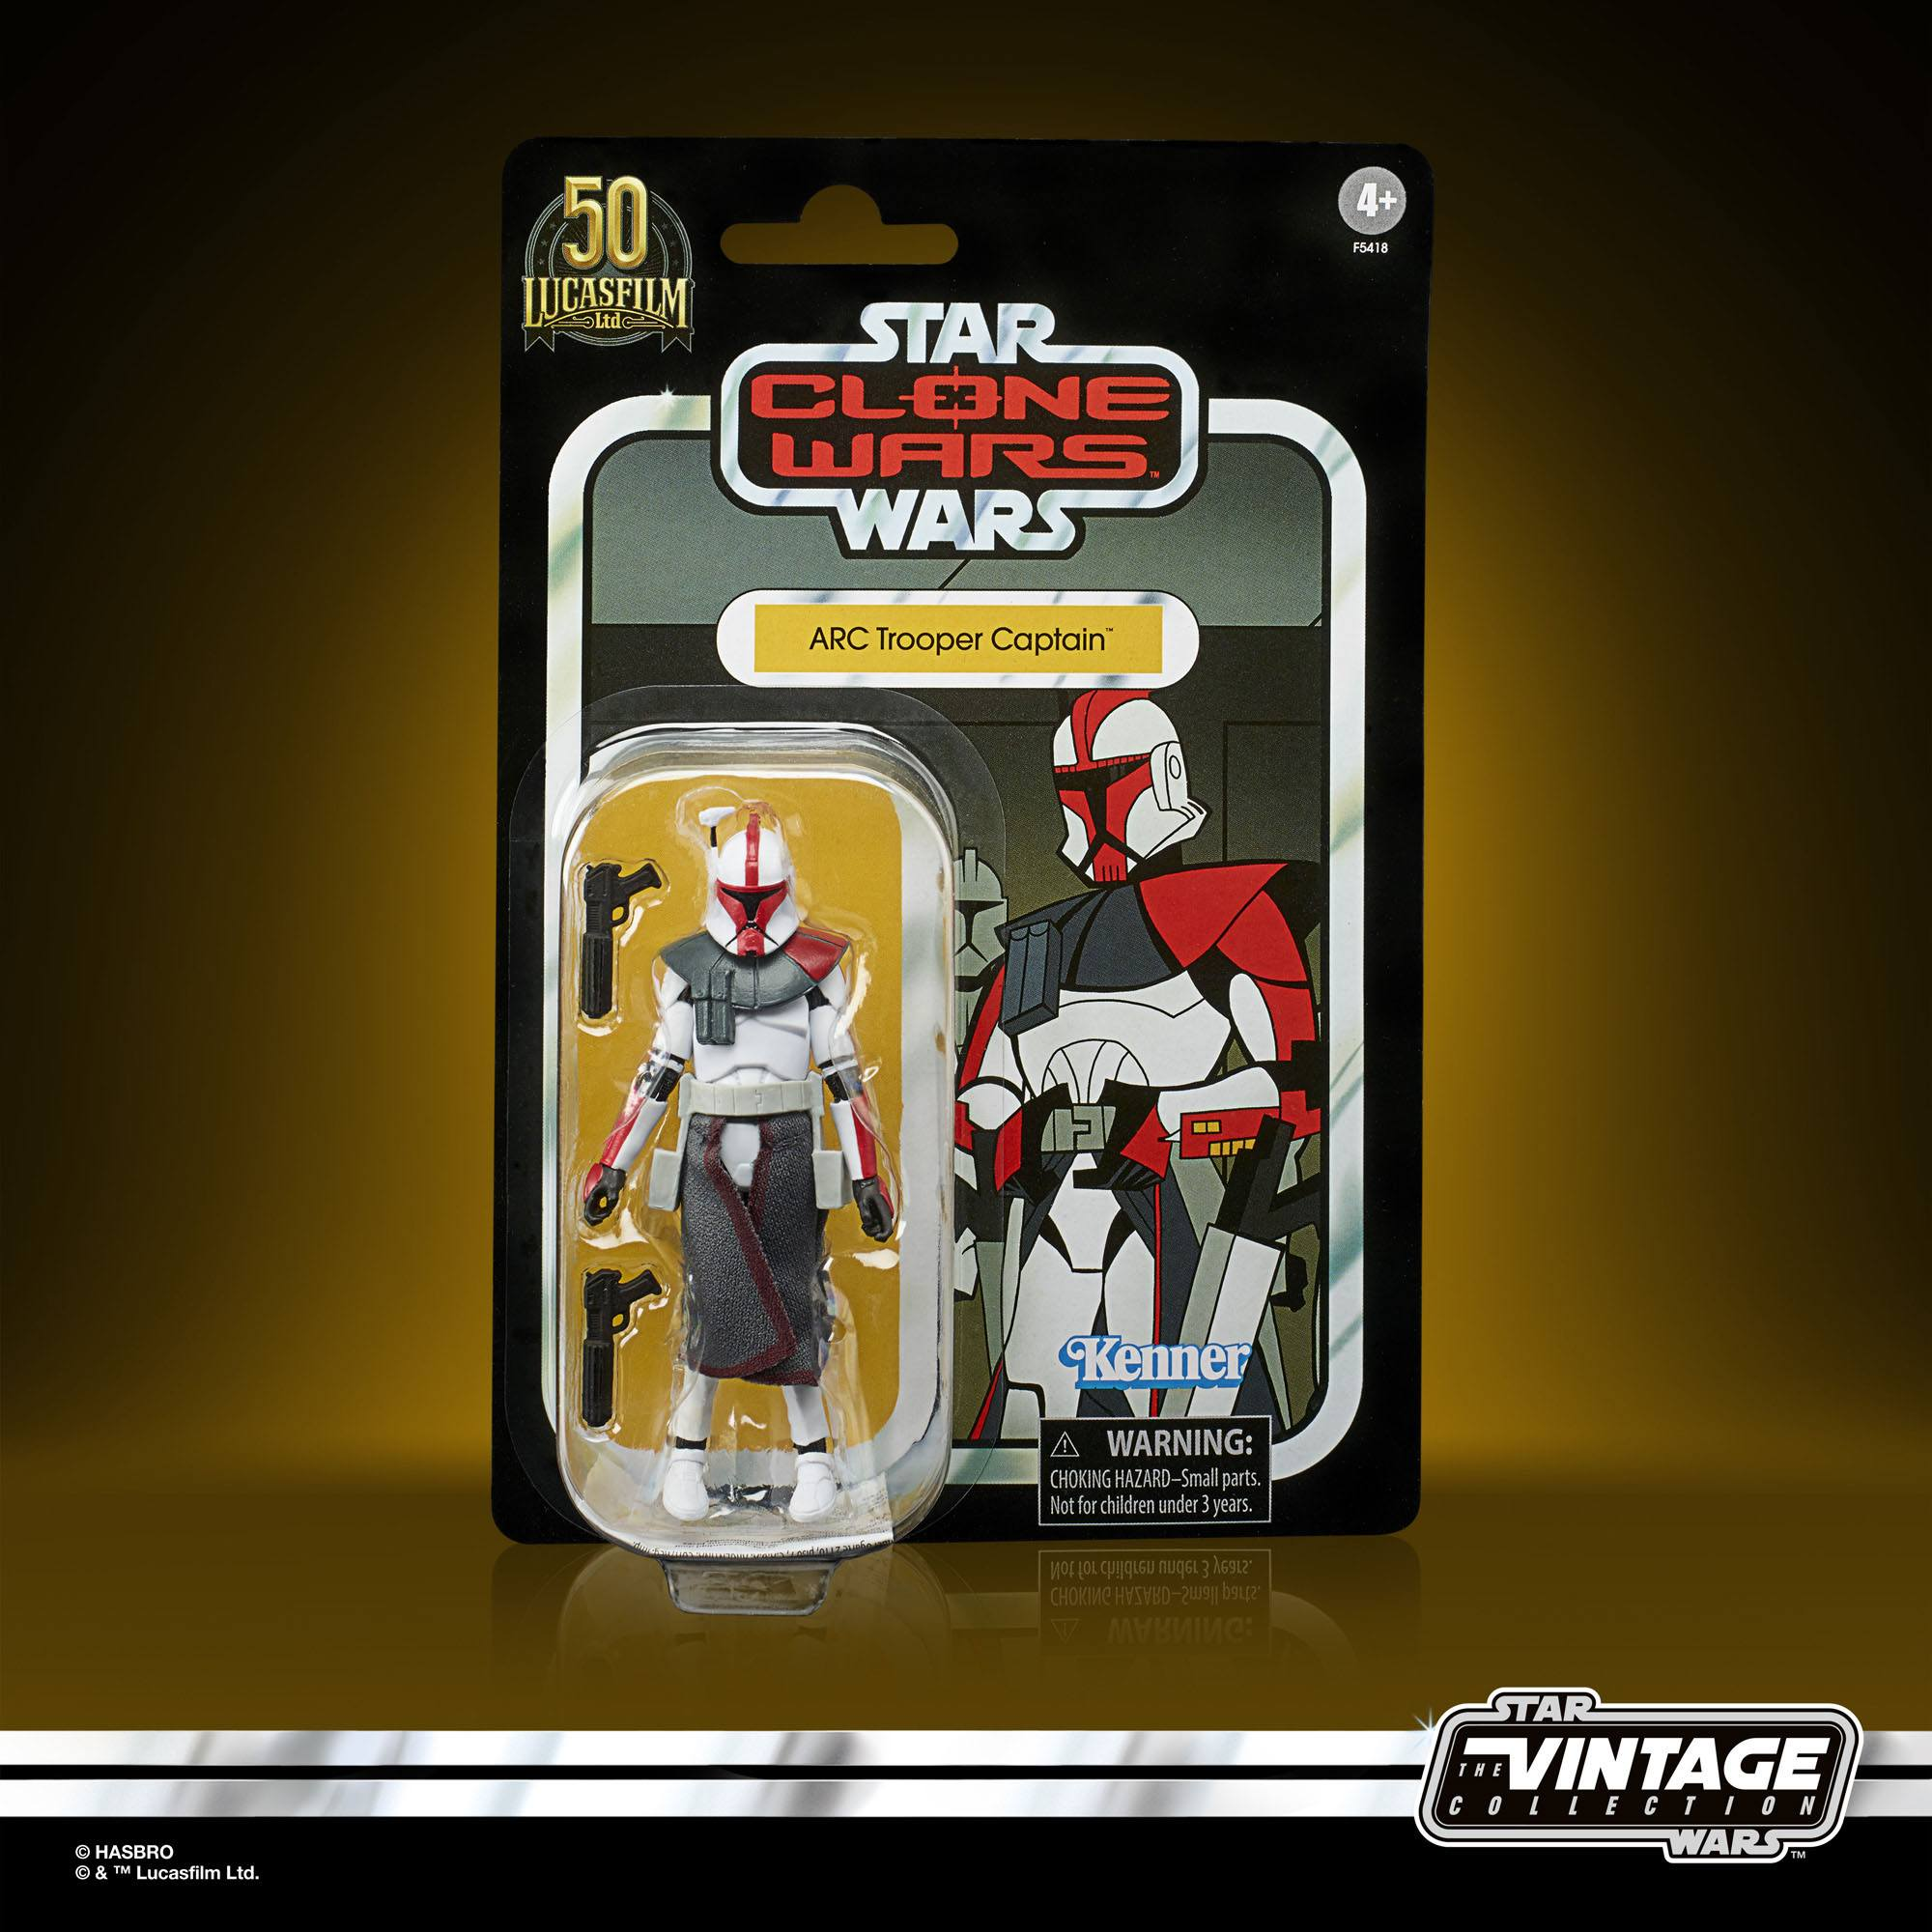 Star Wars The Clone Wars Vintage Collection Actionfigur 2022 ARC Trooper Captain 10 cm F54185L00